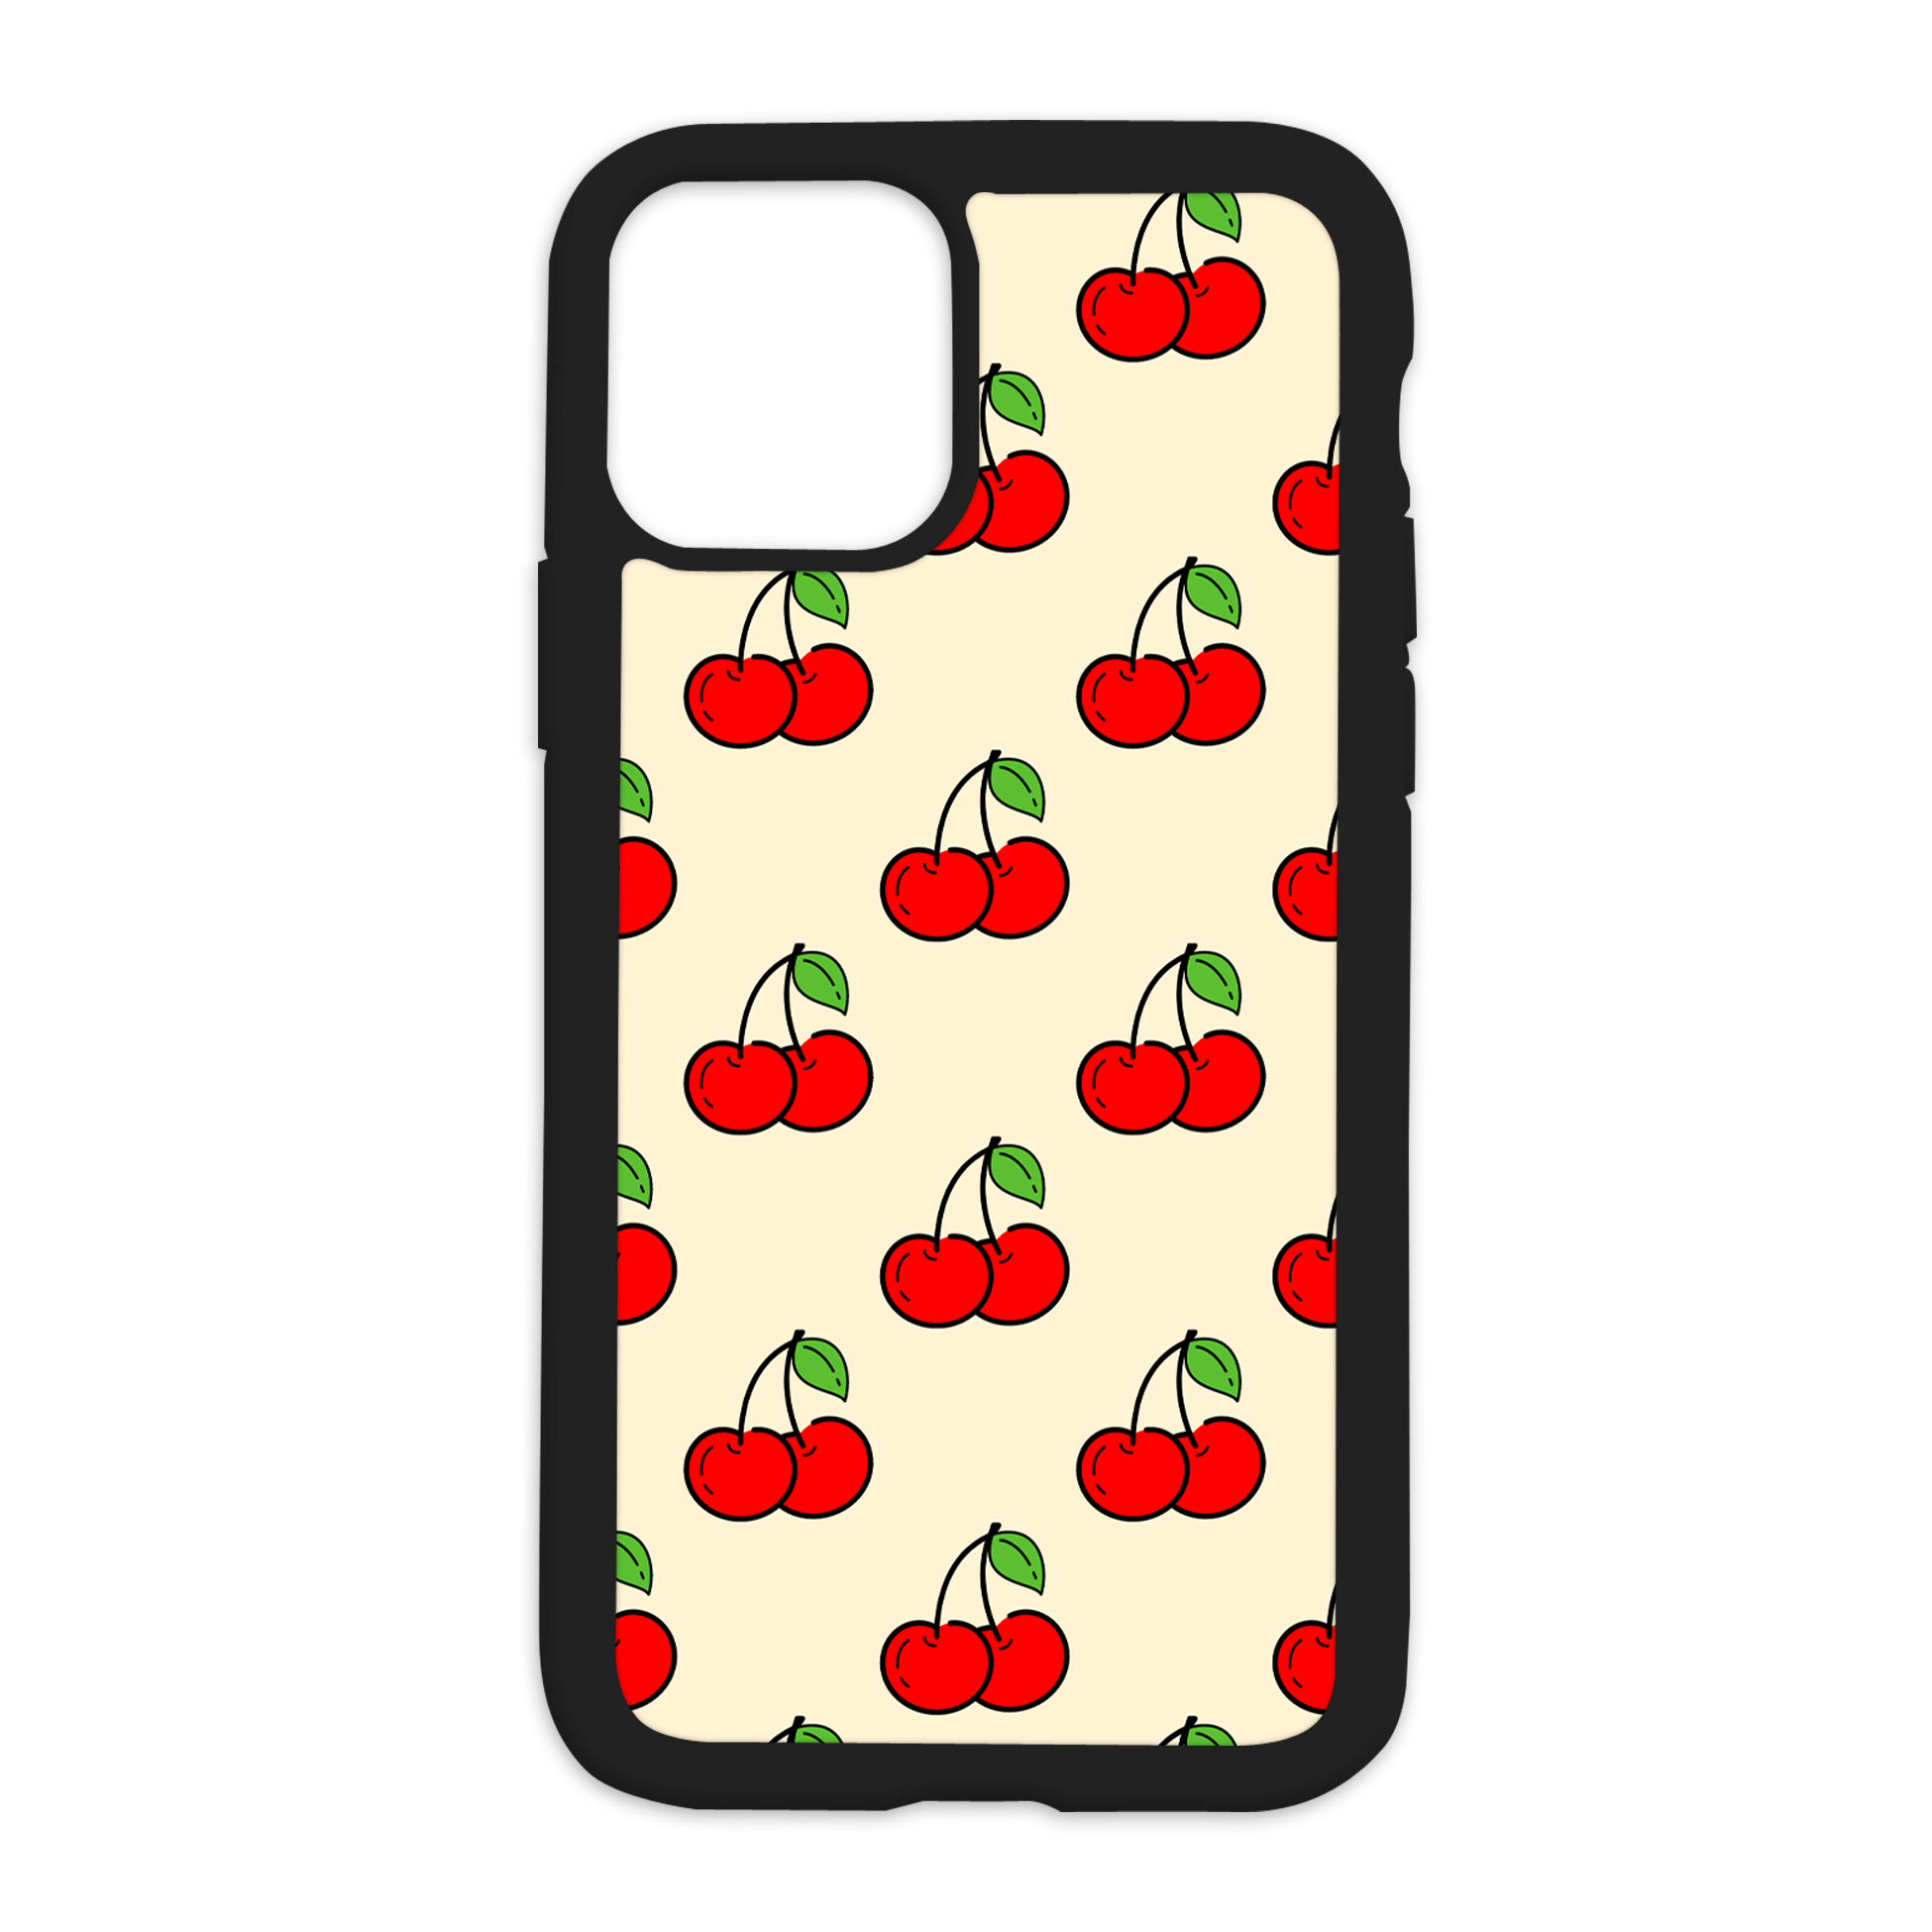 Cherry Pattern Design On Black Phone Case - 6/6s+ / Yellow